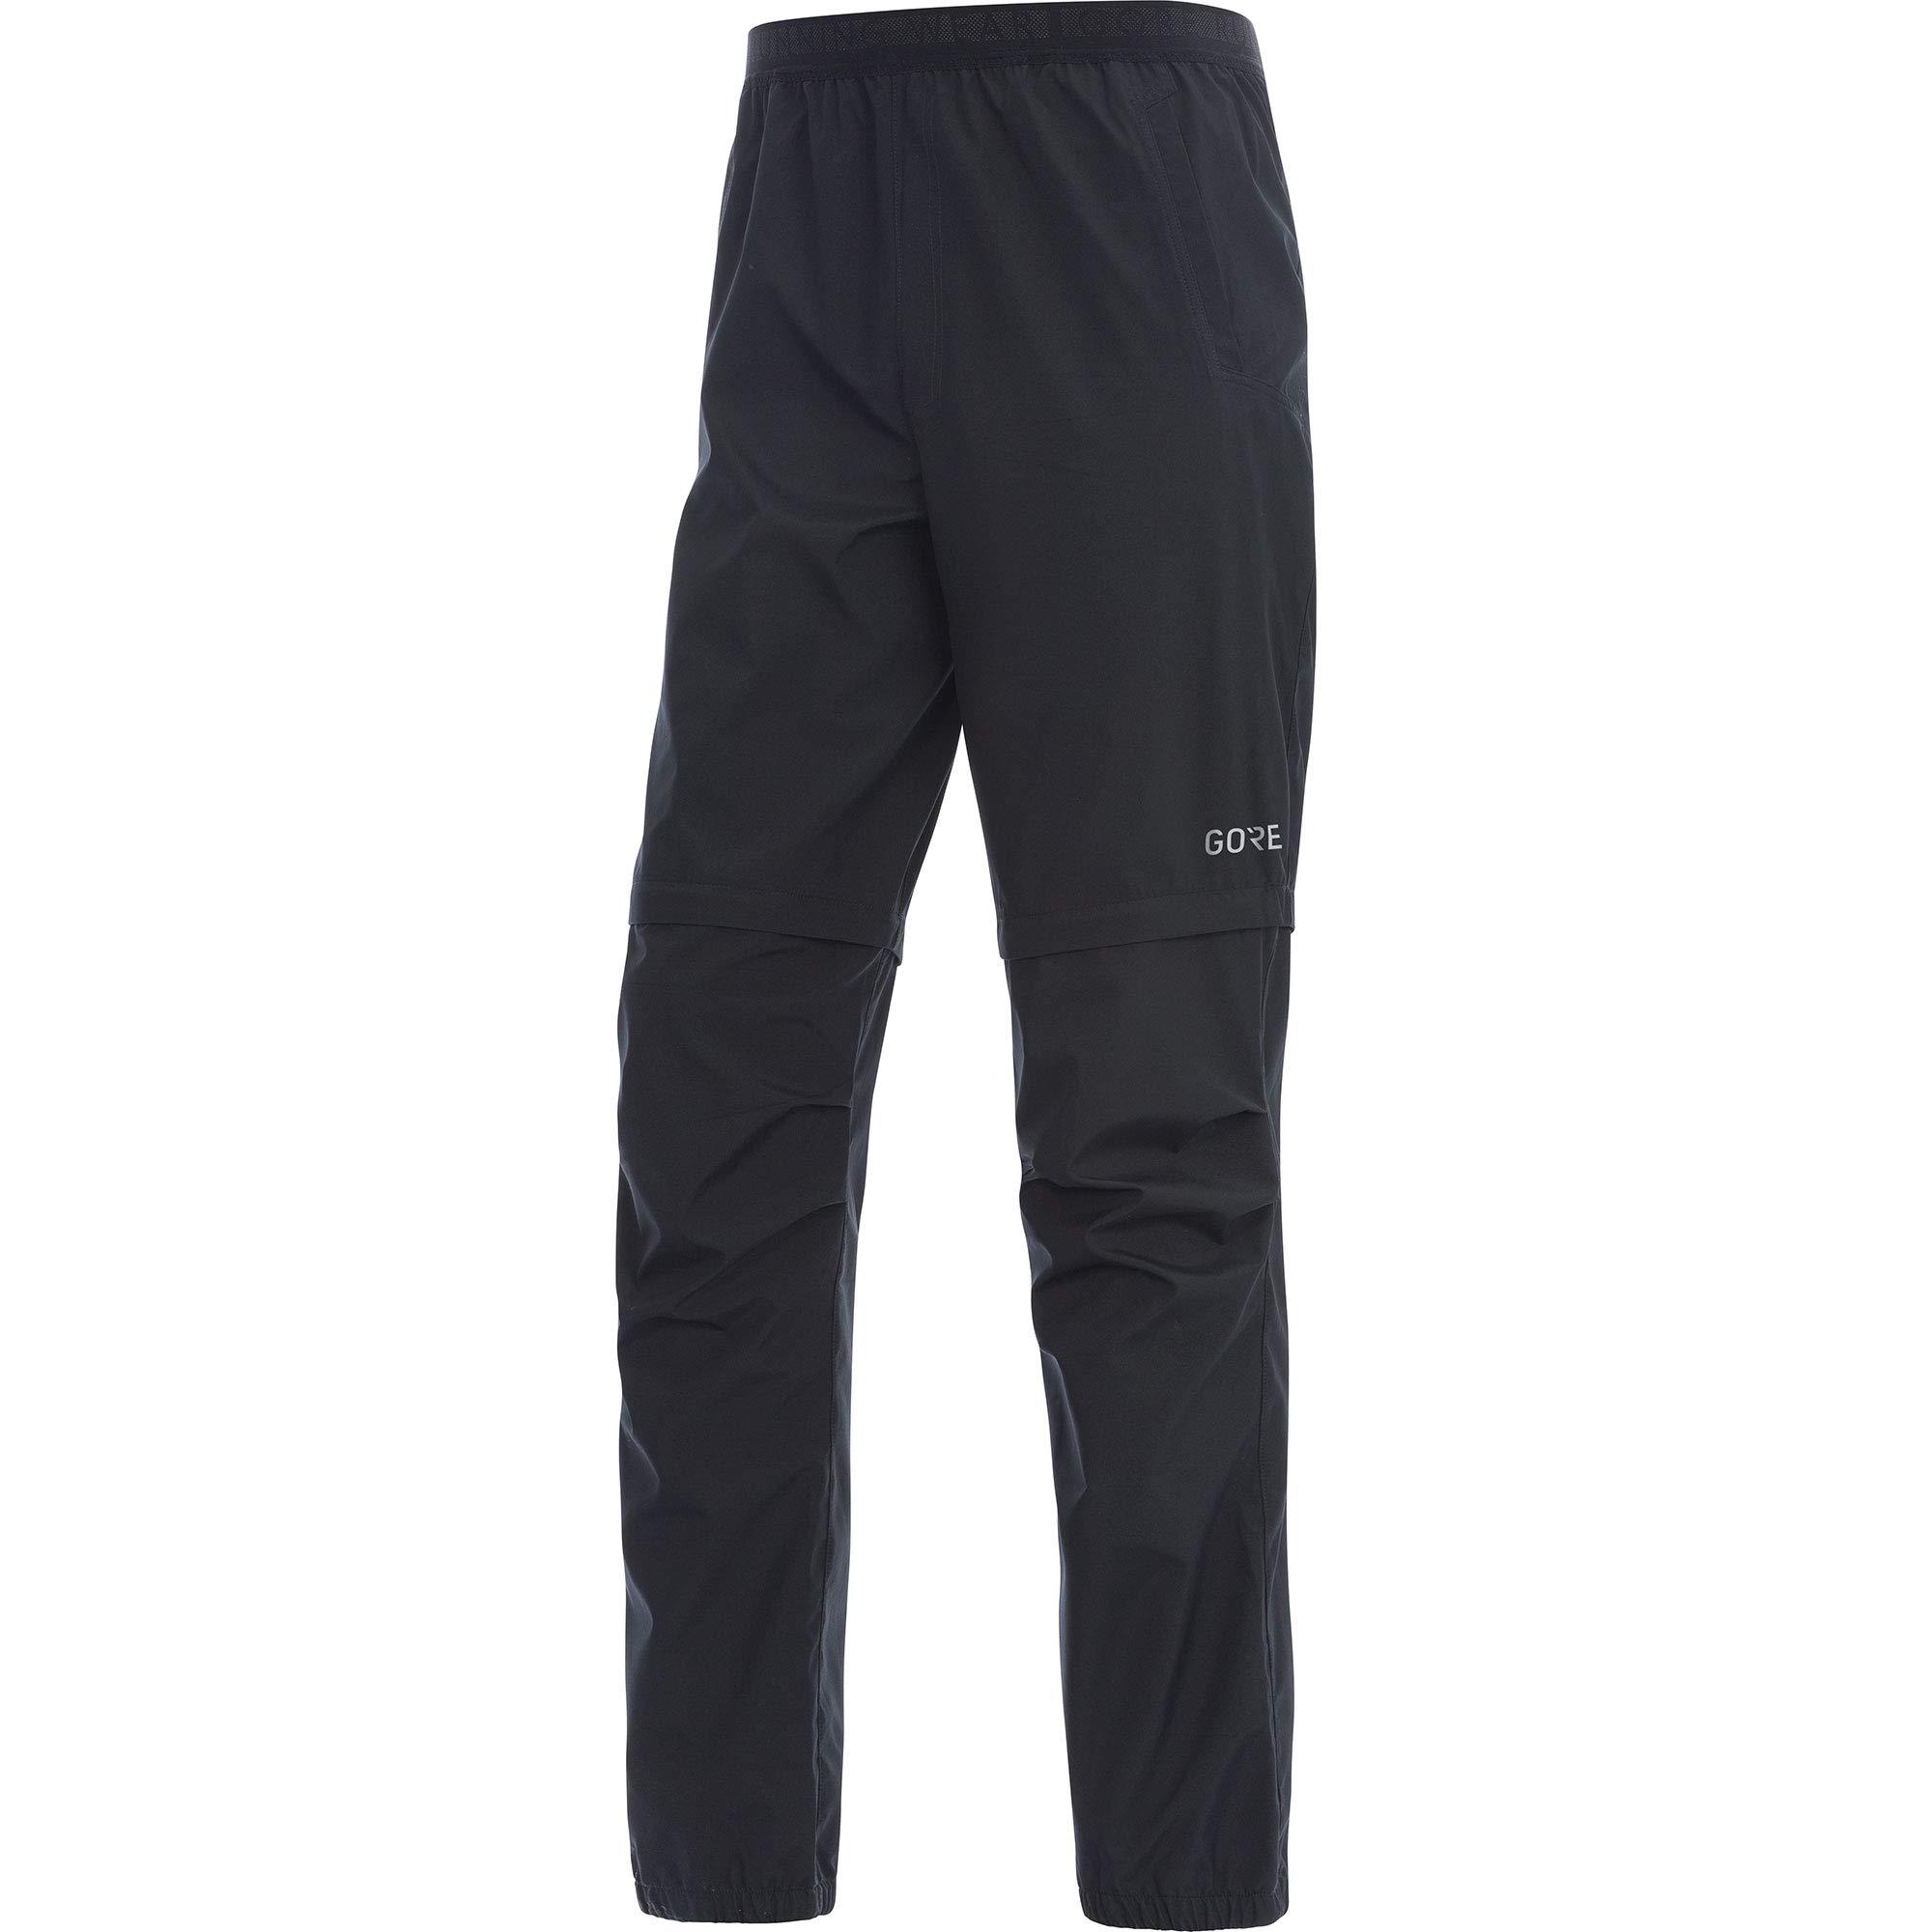 Gore Men's R3 Gws Zip-off Pants,  black,  M